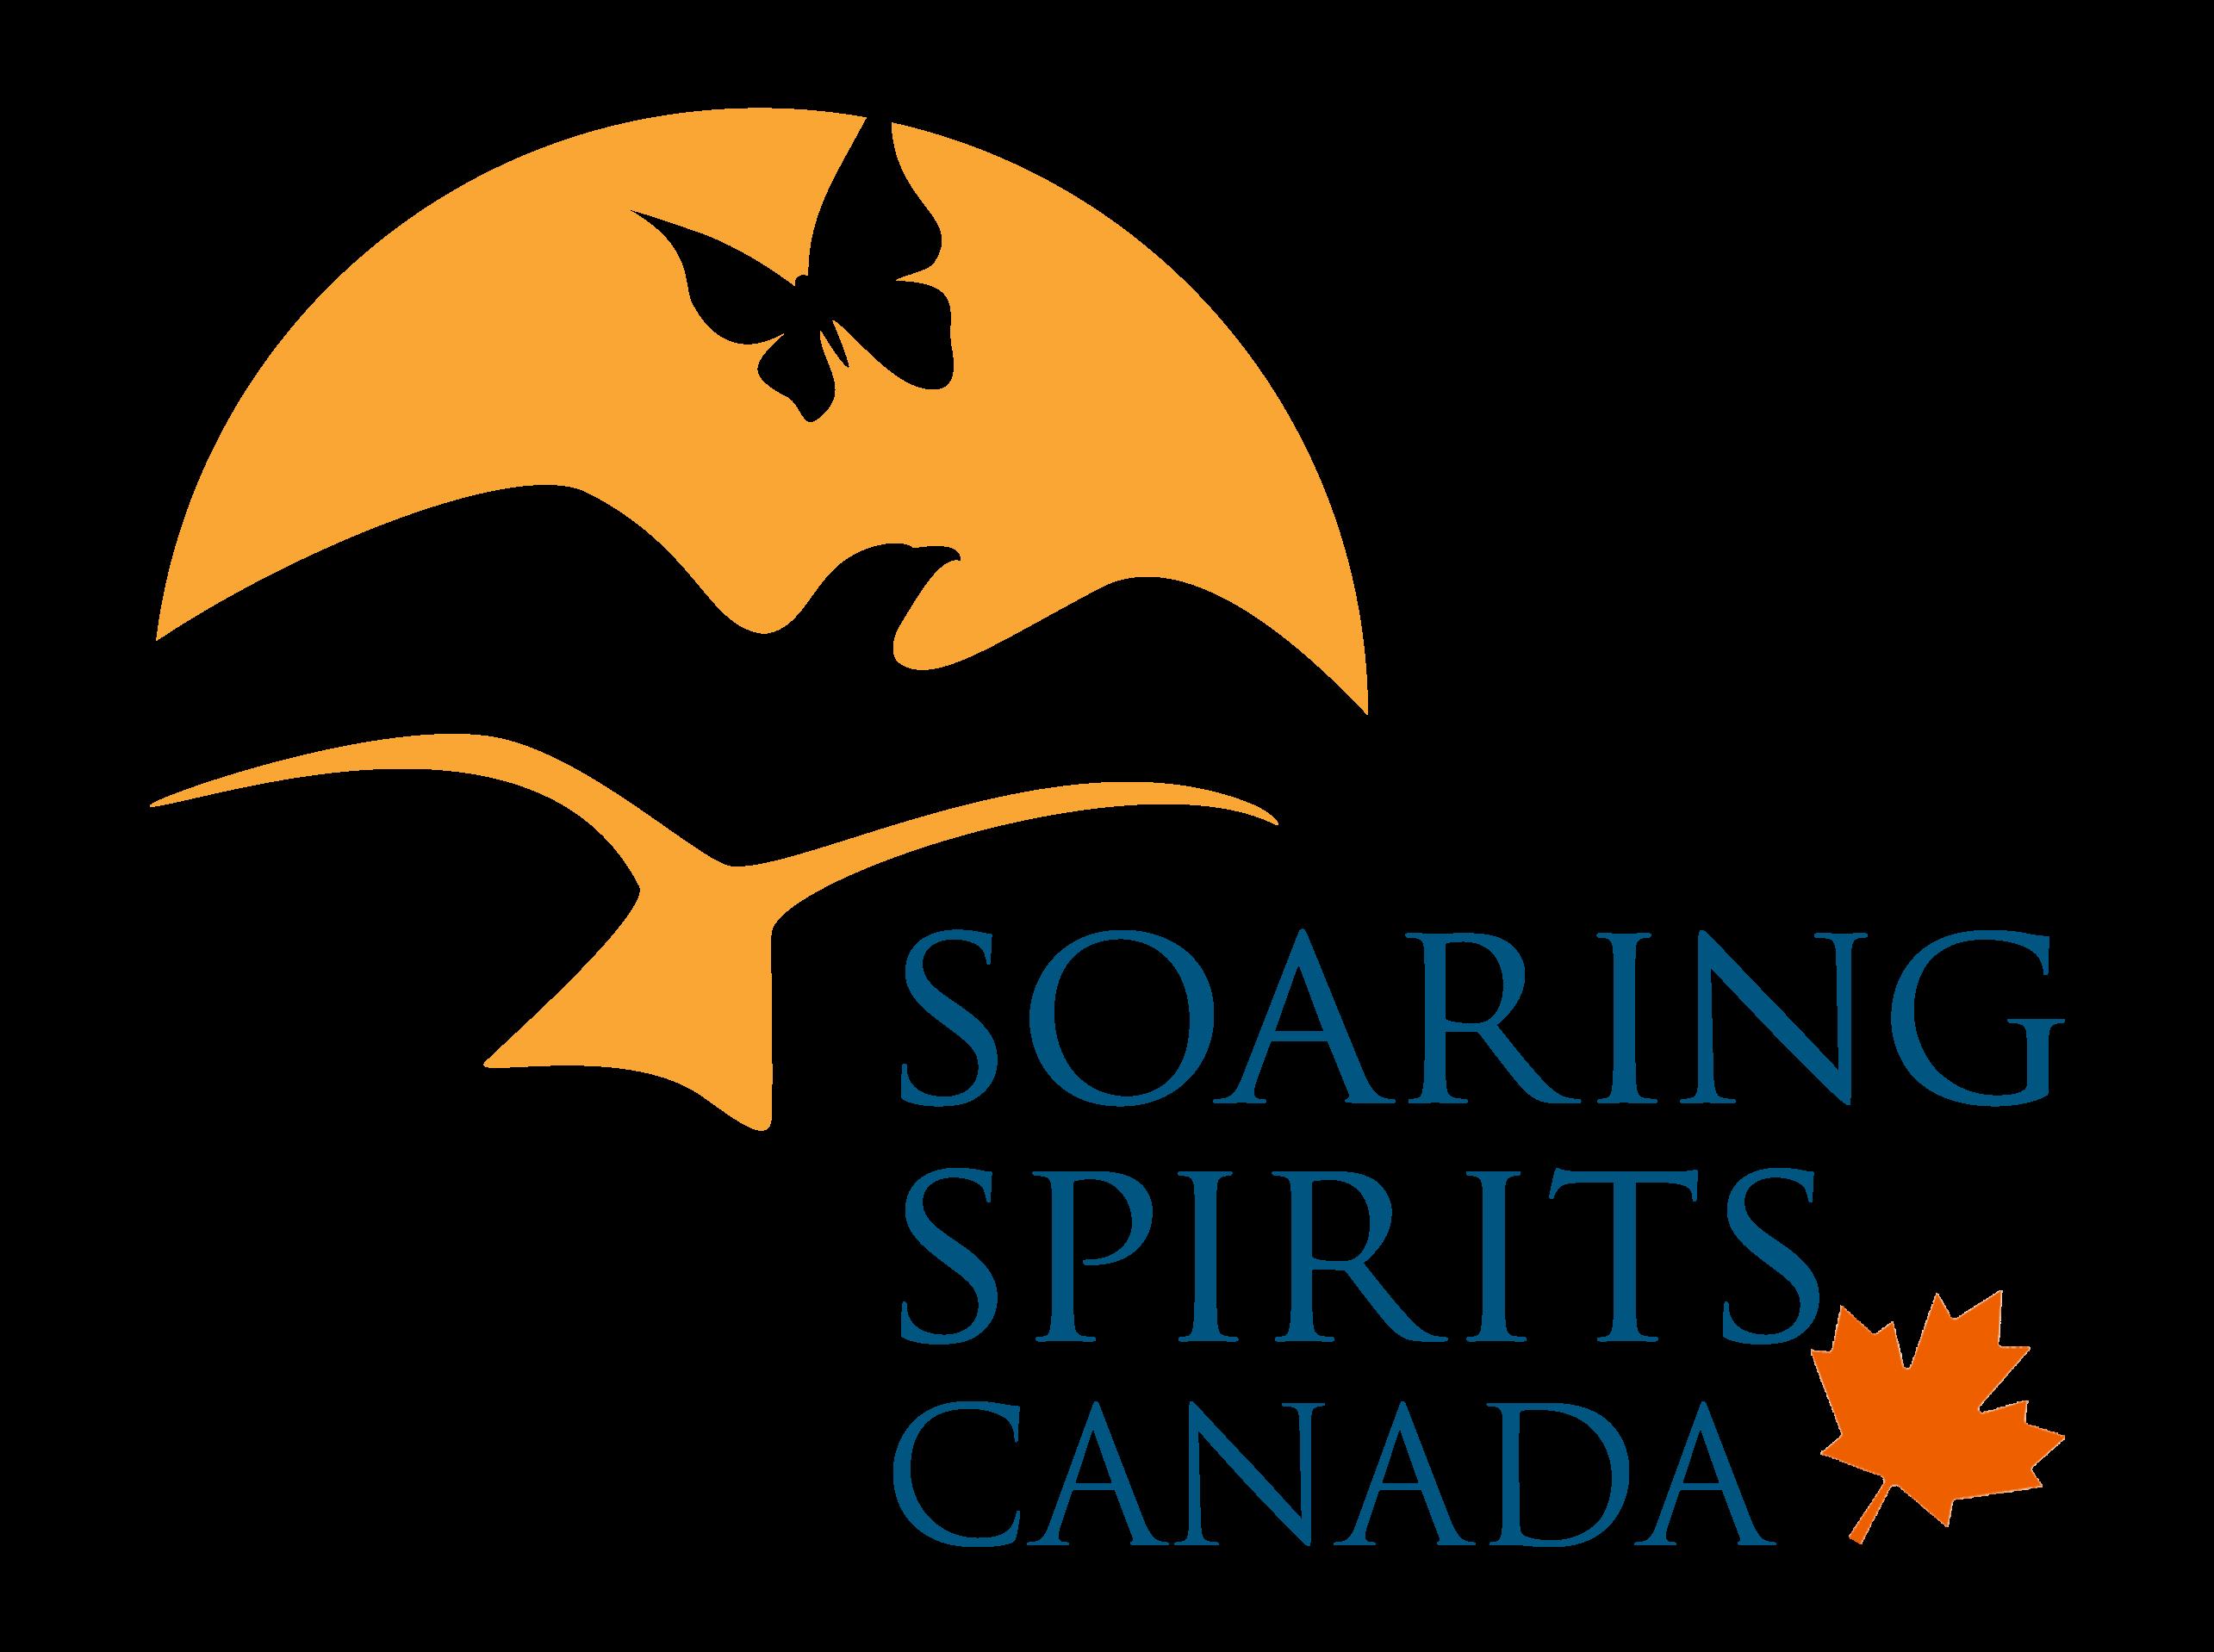 Soaring Spirits Canada